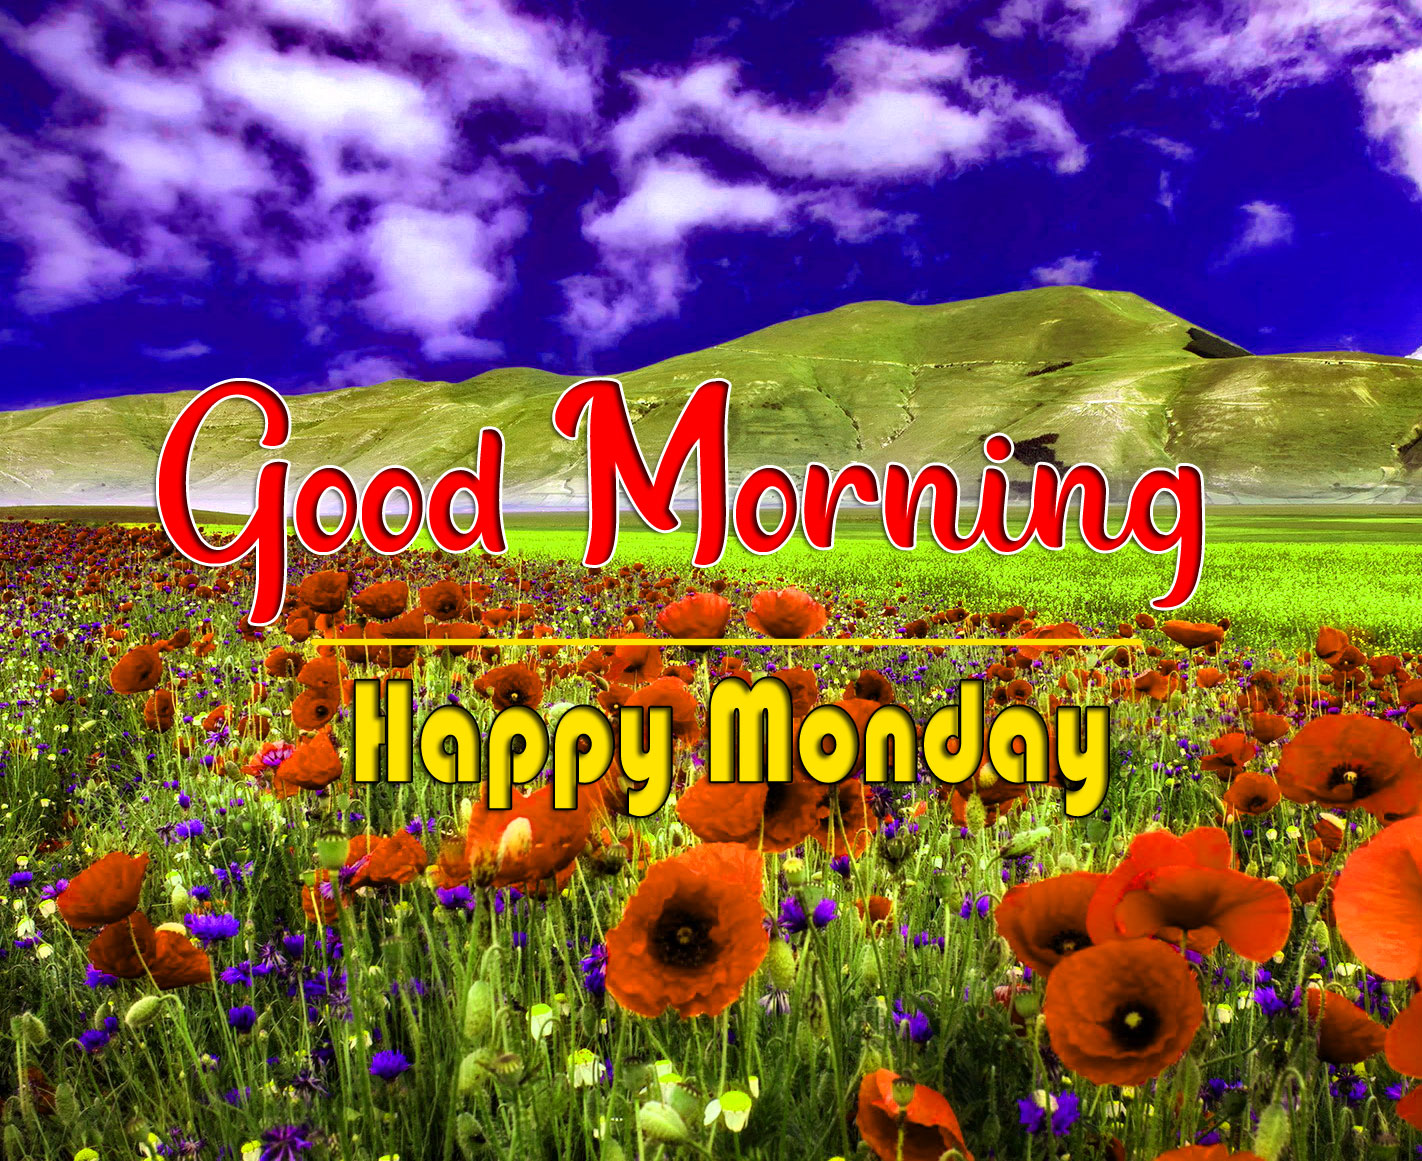 New HD Monday Good Morning Pics Wallpaper